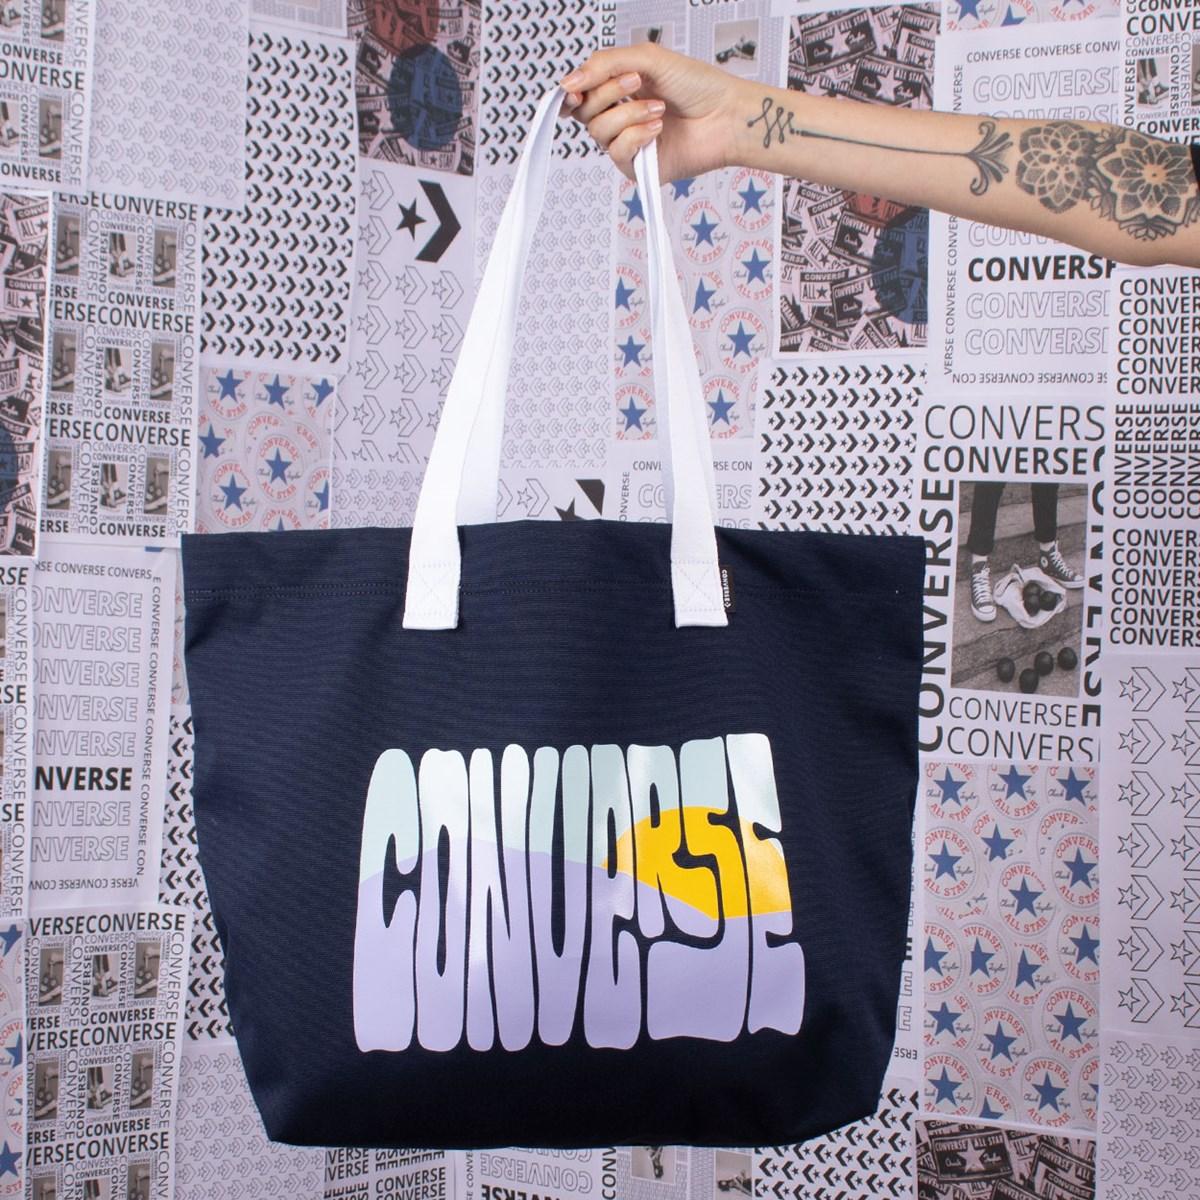 Bolsa Converse Canvas Tote Obsidian 10018969-A01